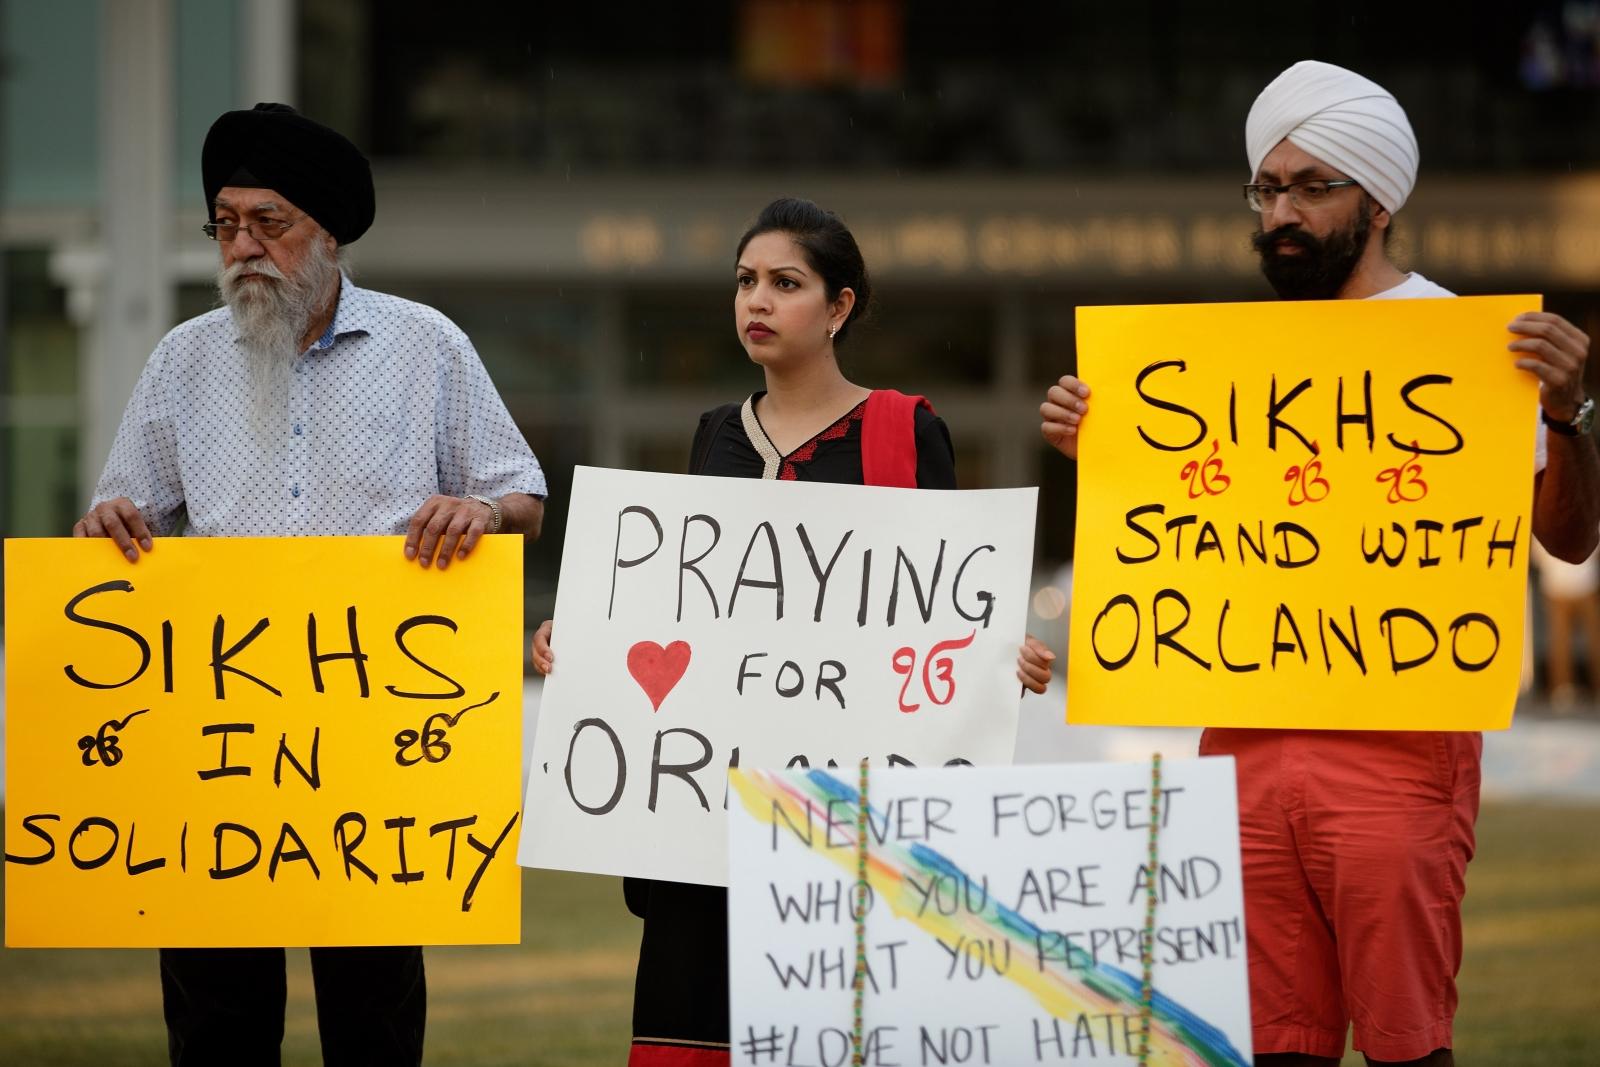 Sikhs in America